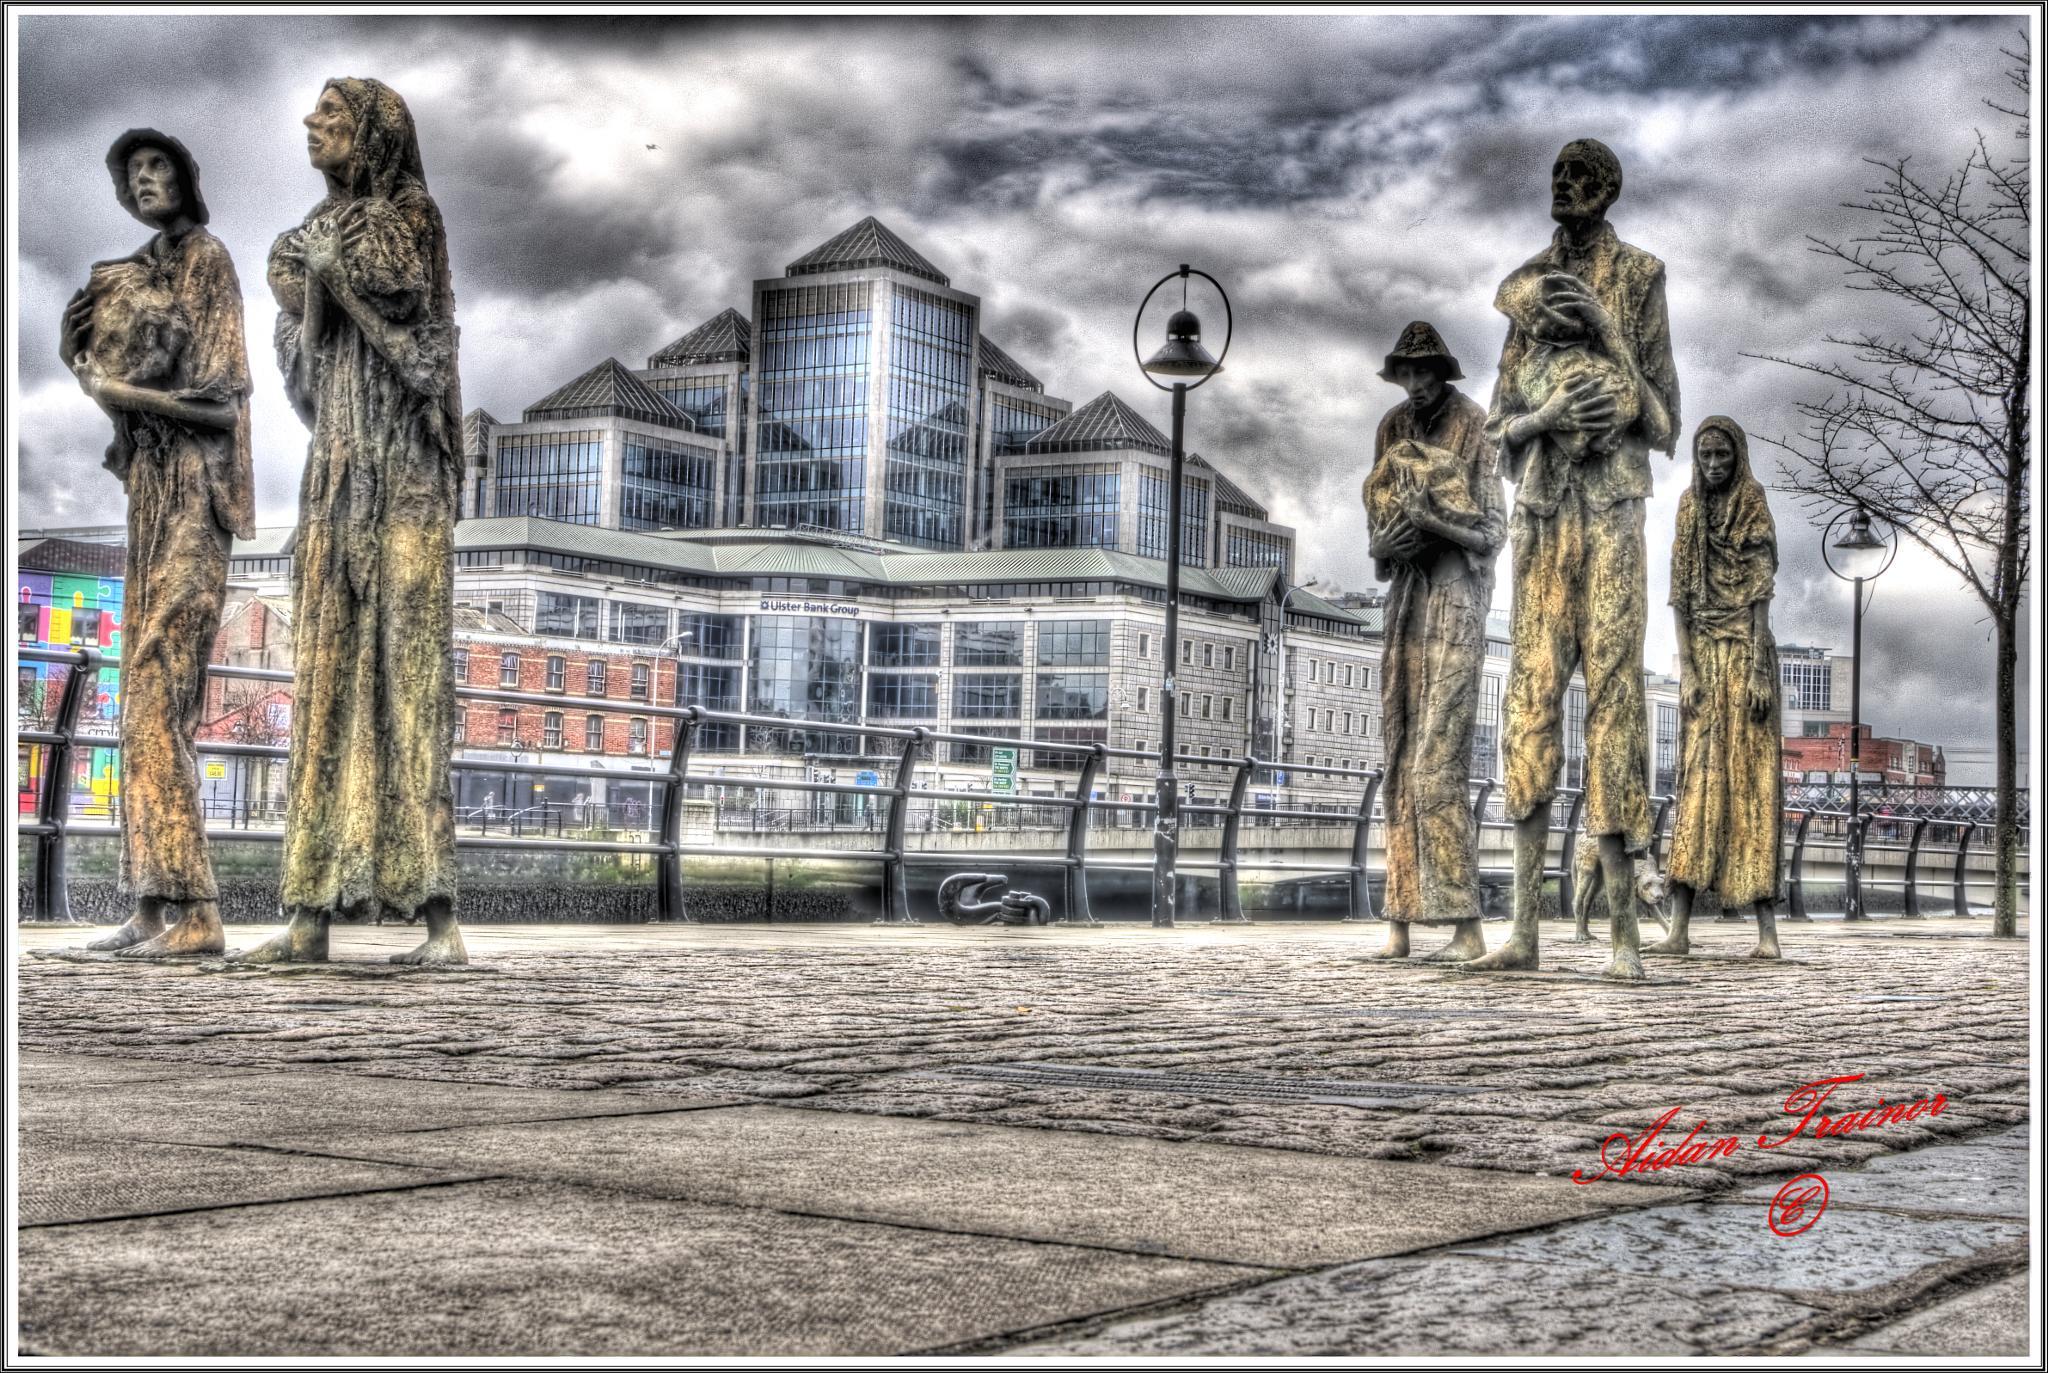 Famine memorial Dublin by Hailceaser